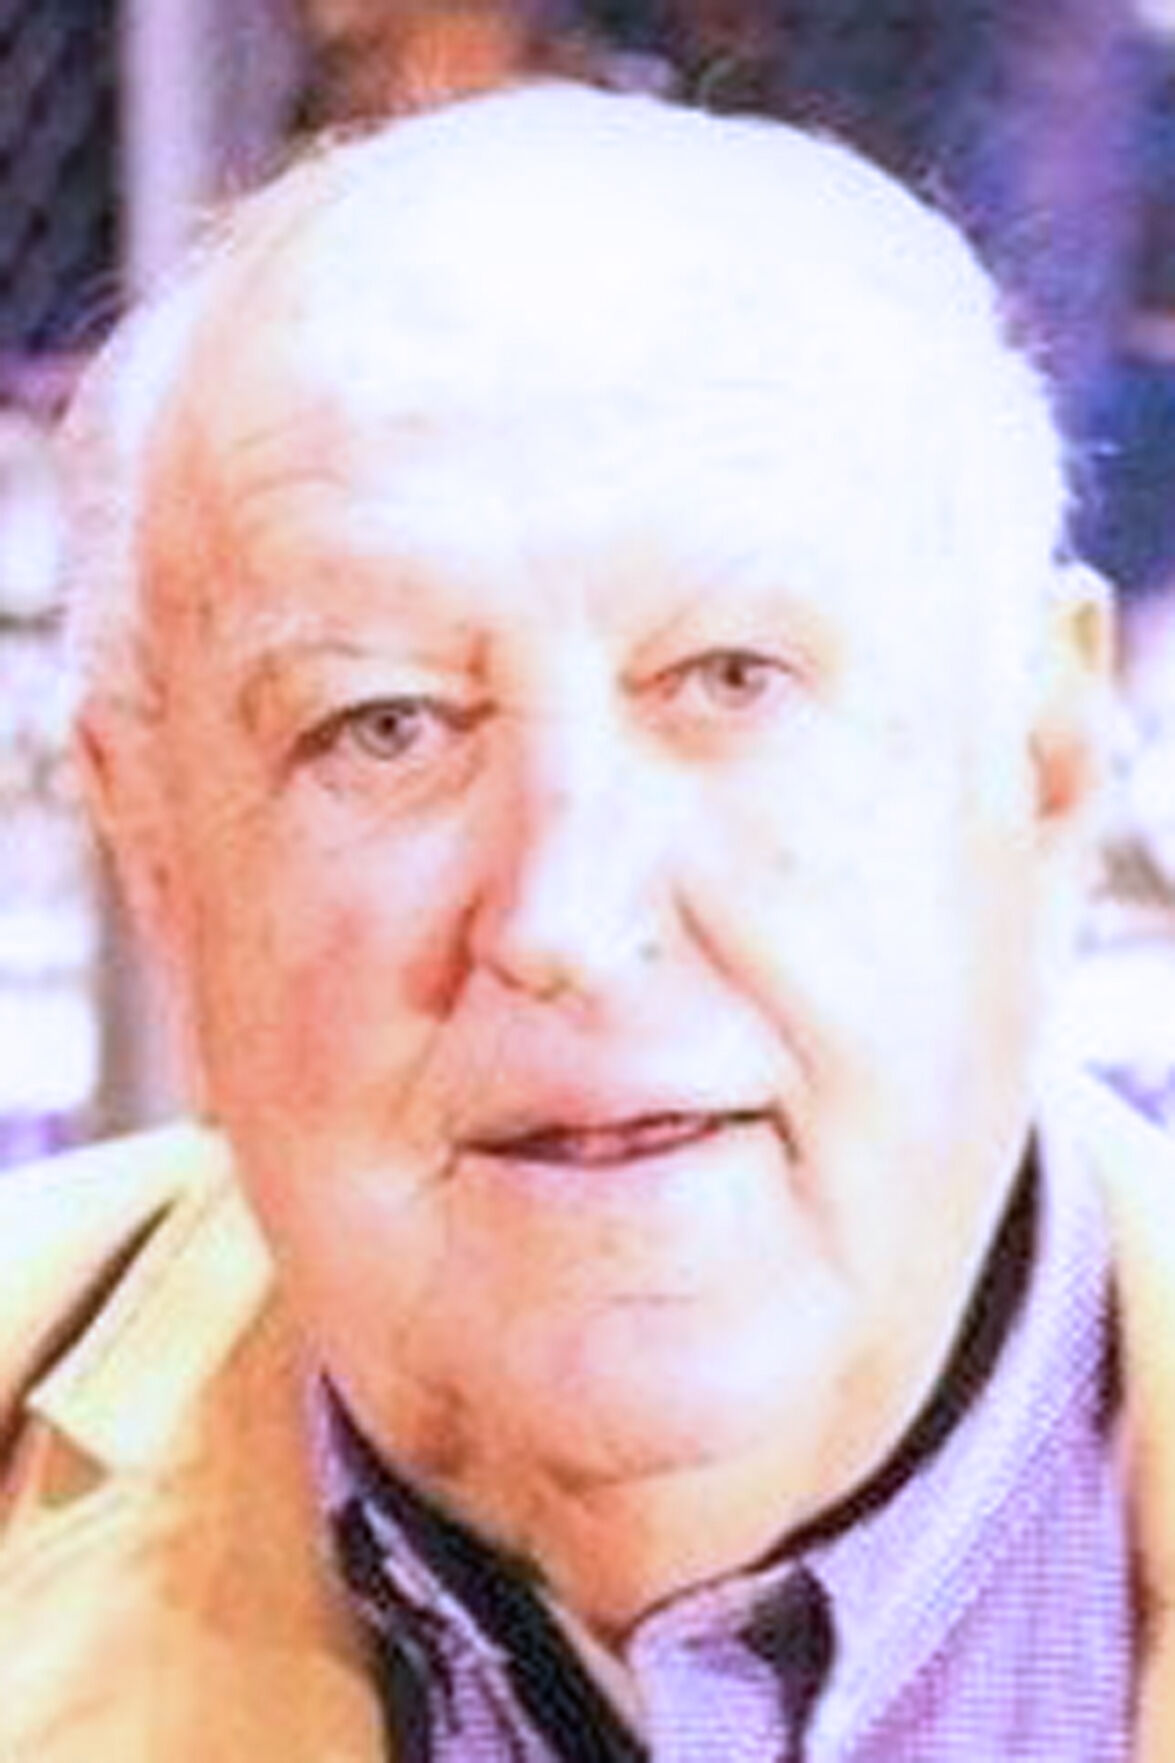 Roger Boughton